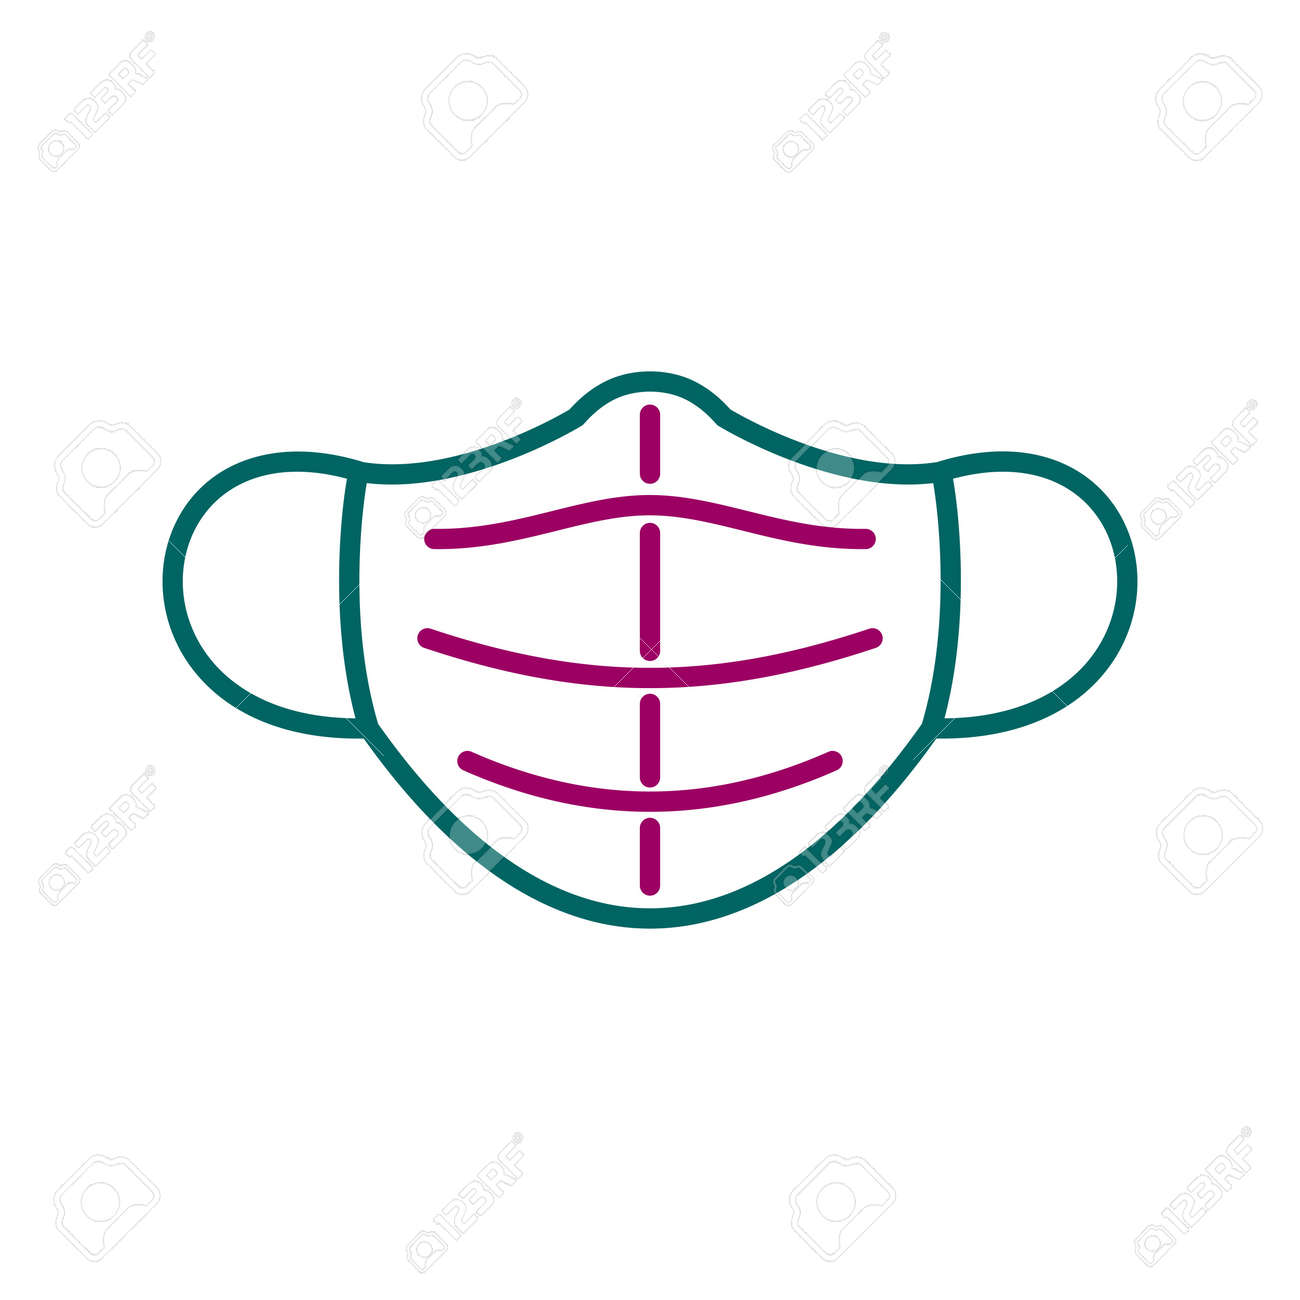 Unique Mask Line Vector Icon - 167962604